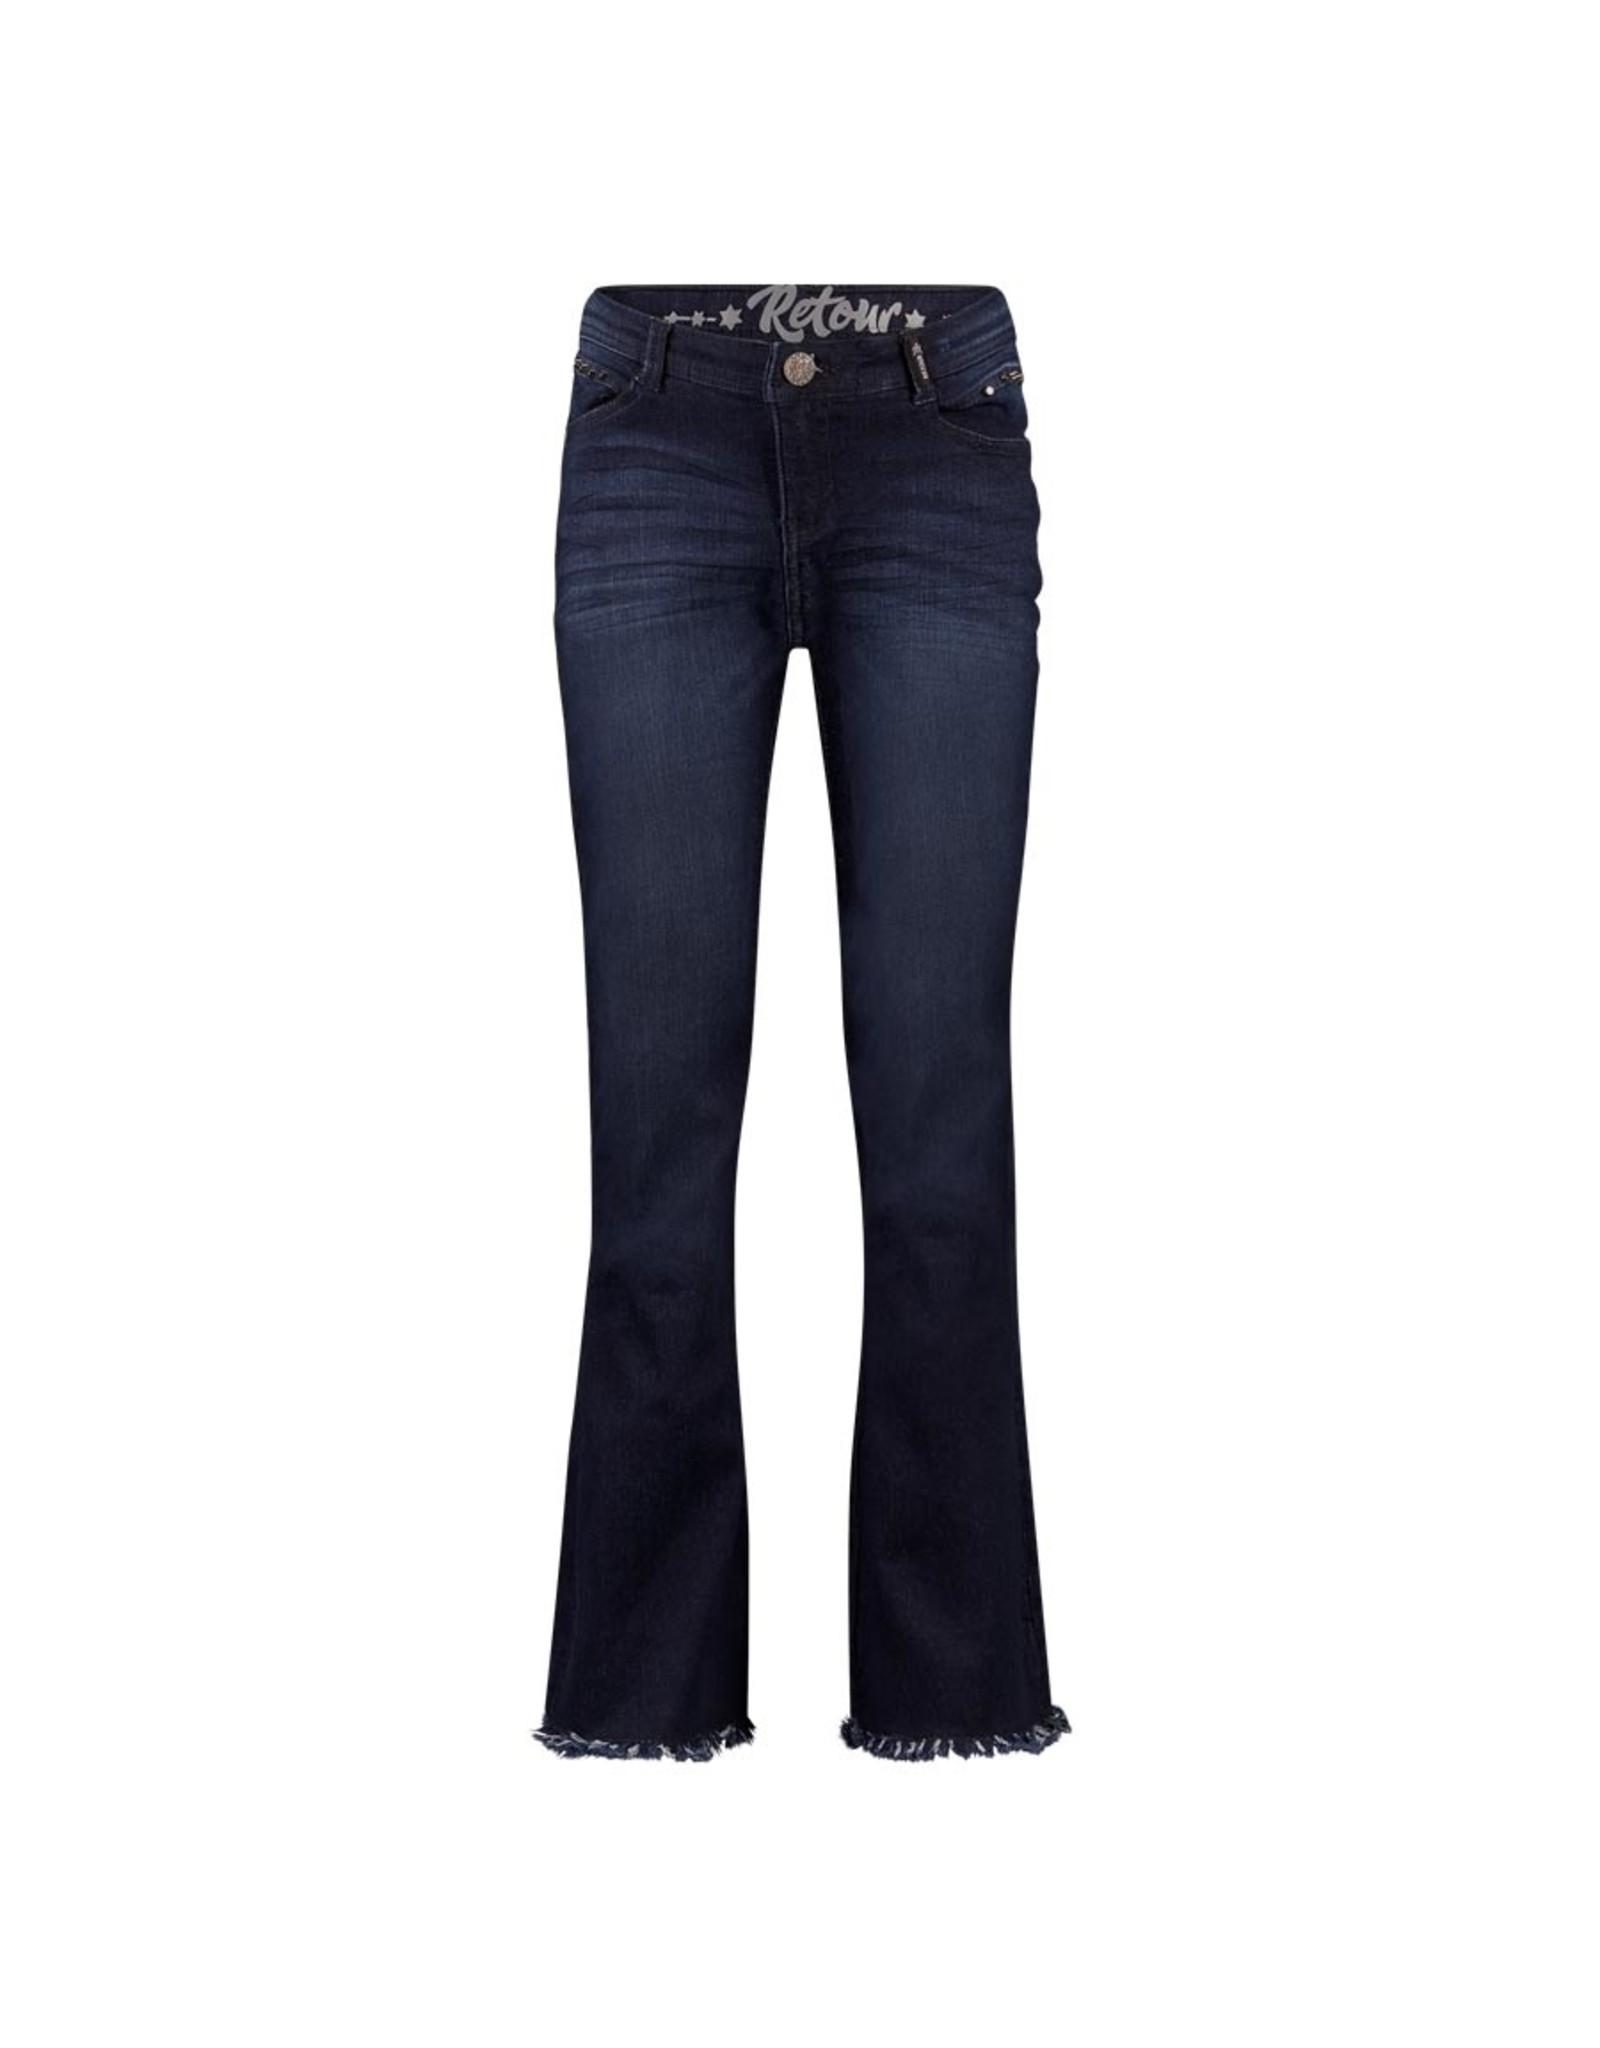 Retour Jeans Denim Annemiek dark blue Denim